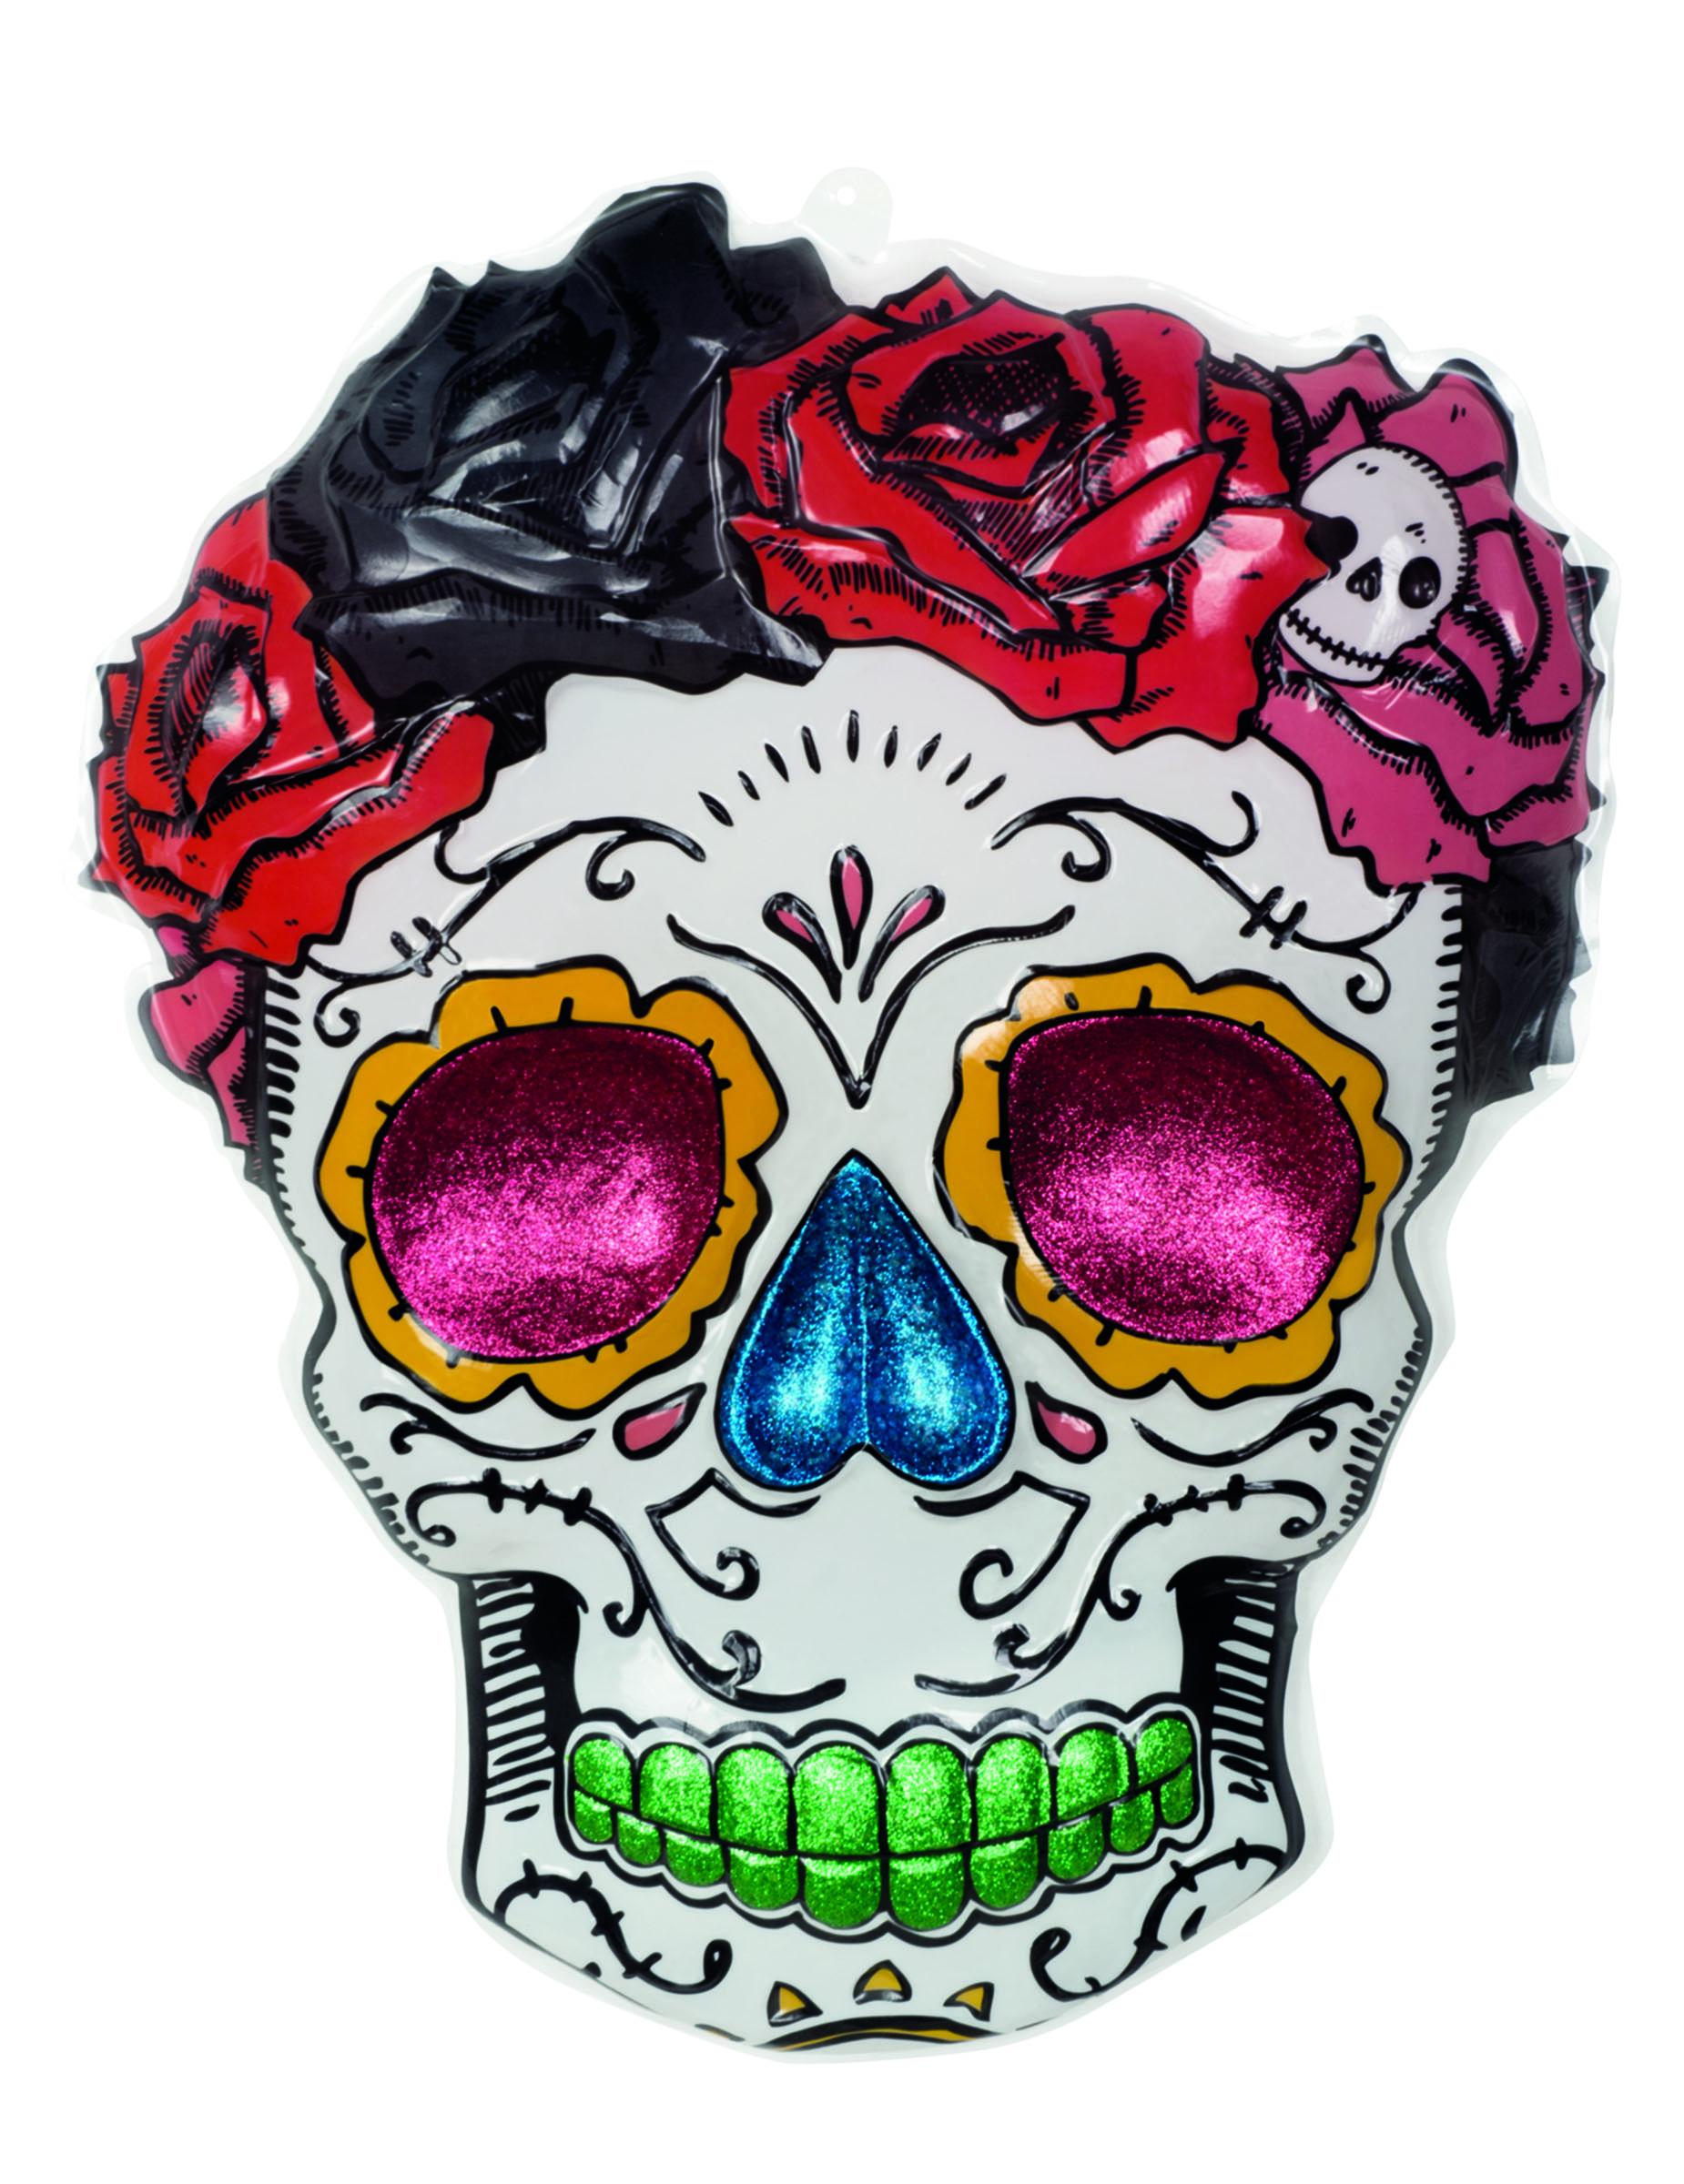 Frau skelett wanddekoration f r halloween - Dekoration fur halloween ...